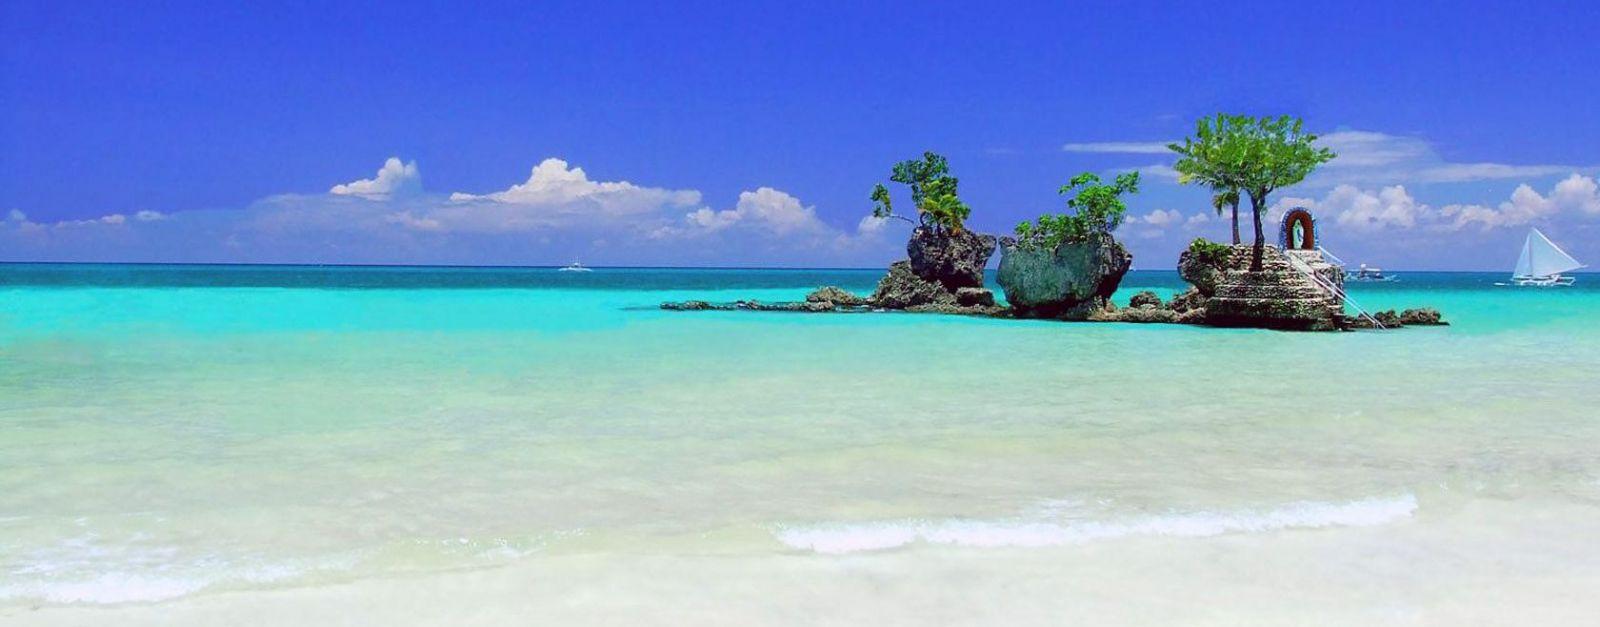 filipines-boracay-white-sands